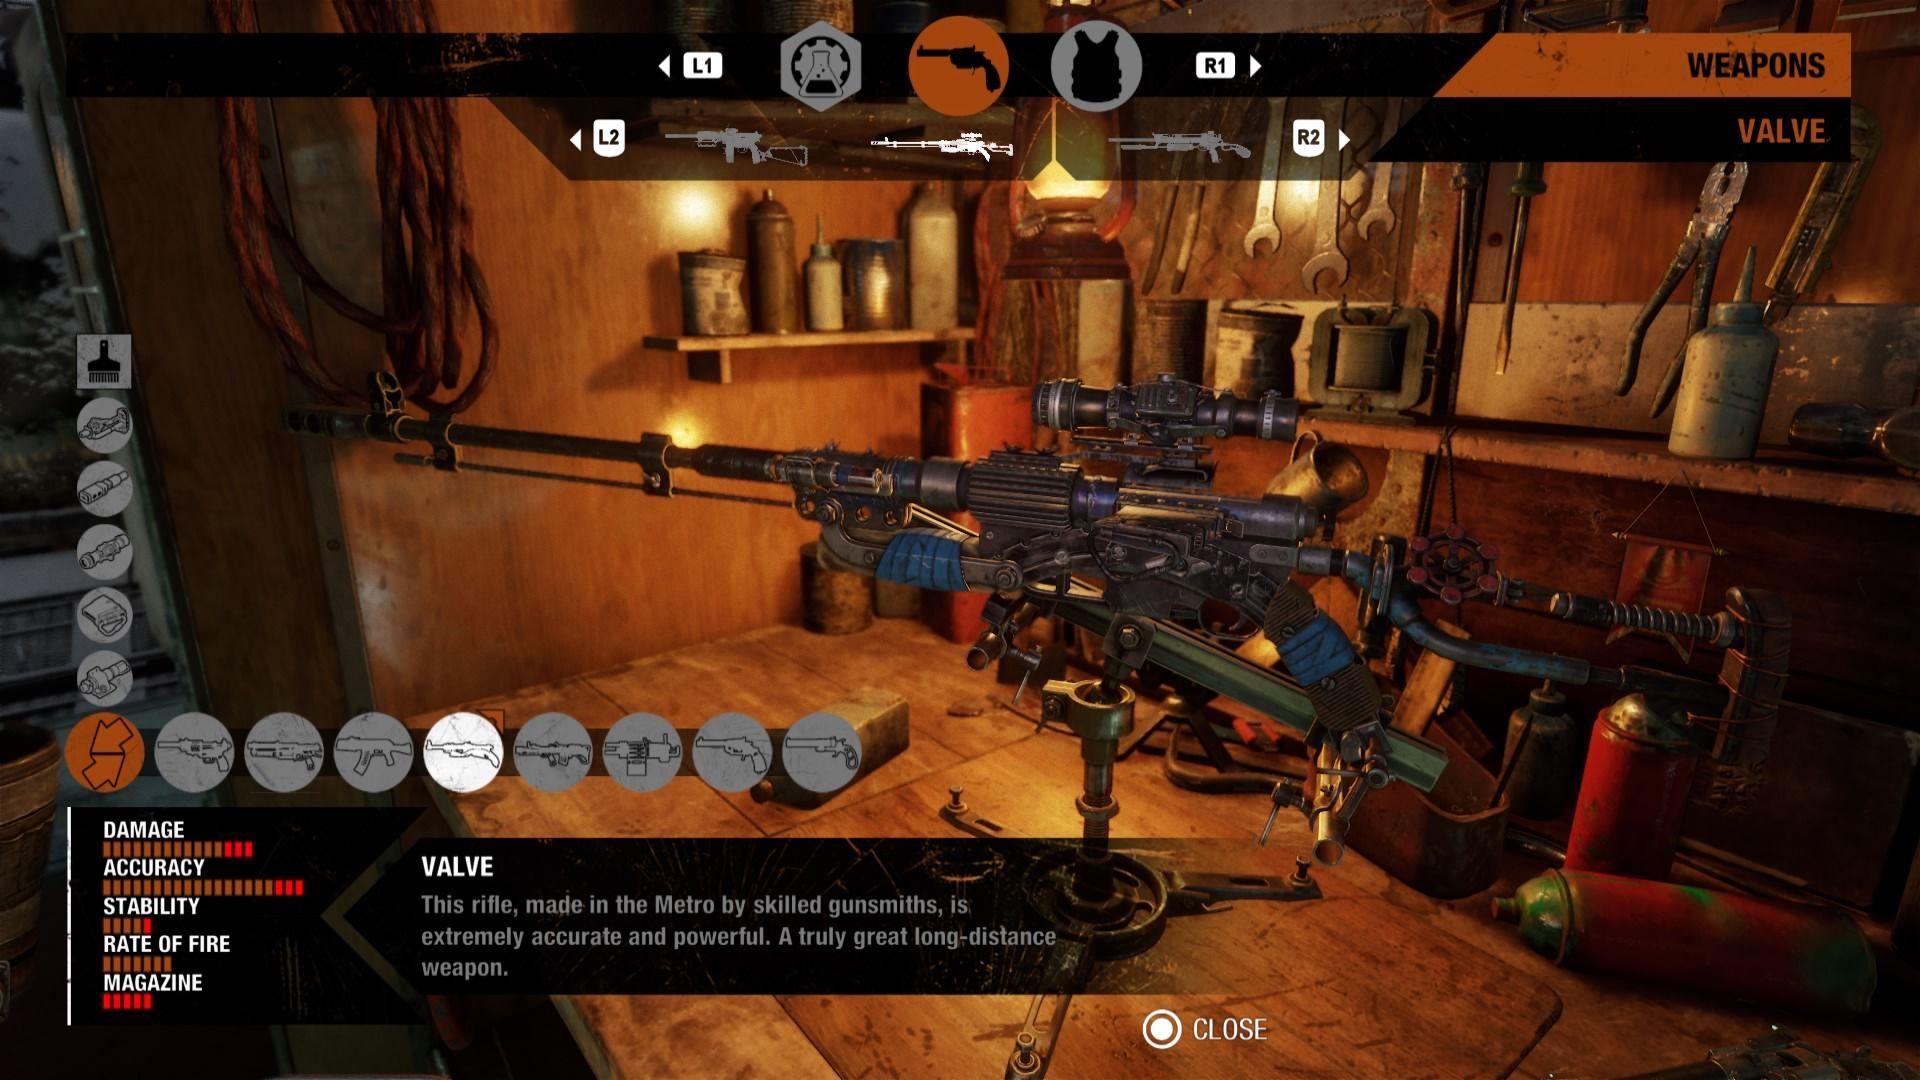 metro-exodus-weapons-list-valve-customization-guide